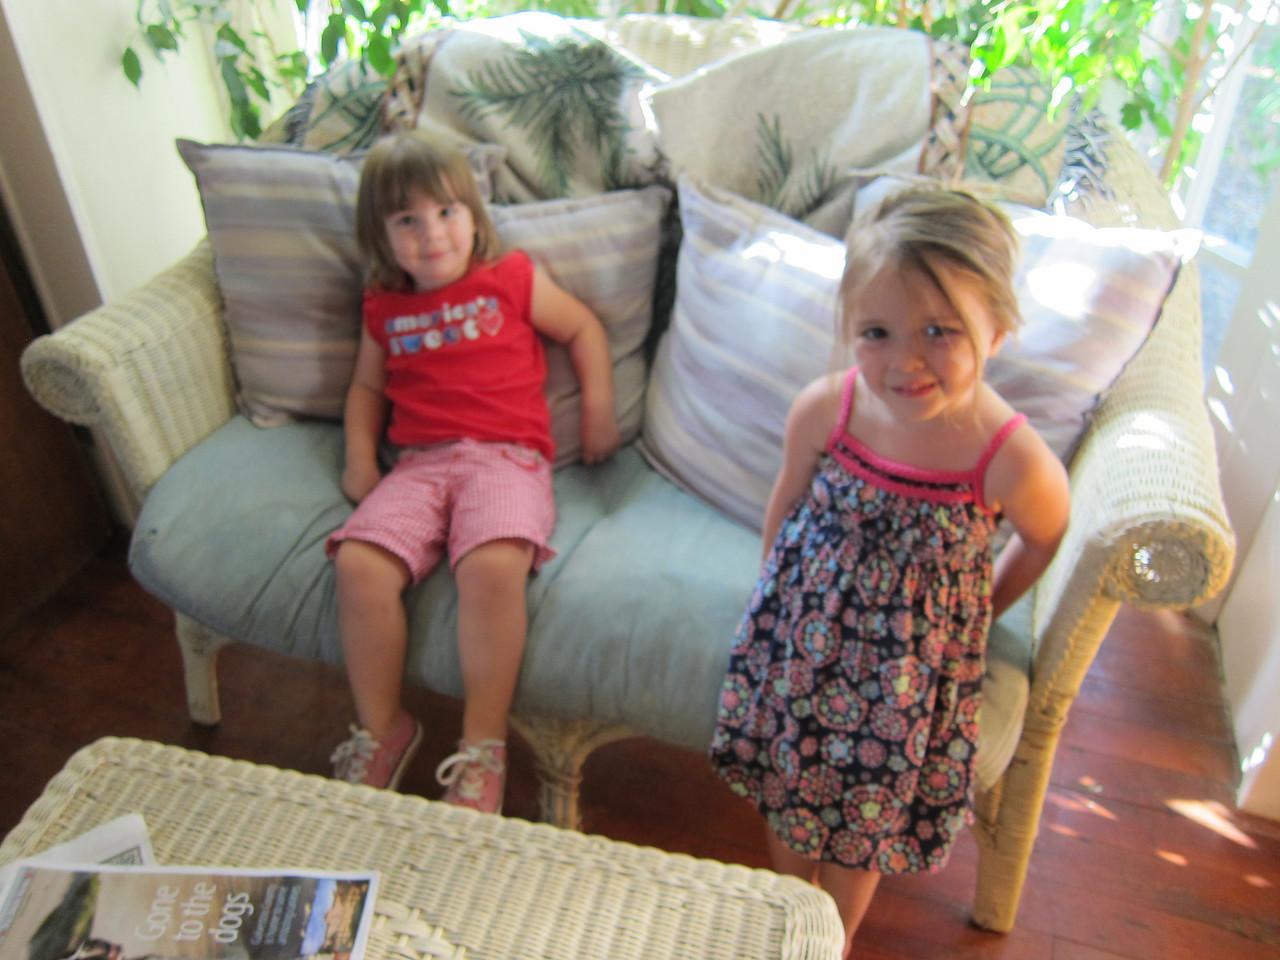 Before dinner at the Larson's beach house